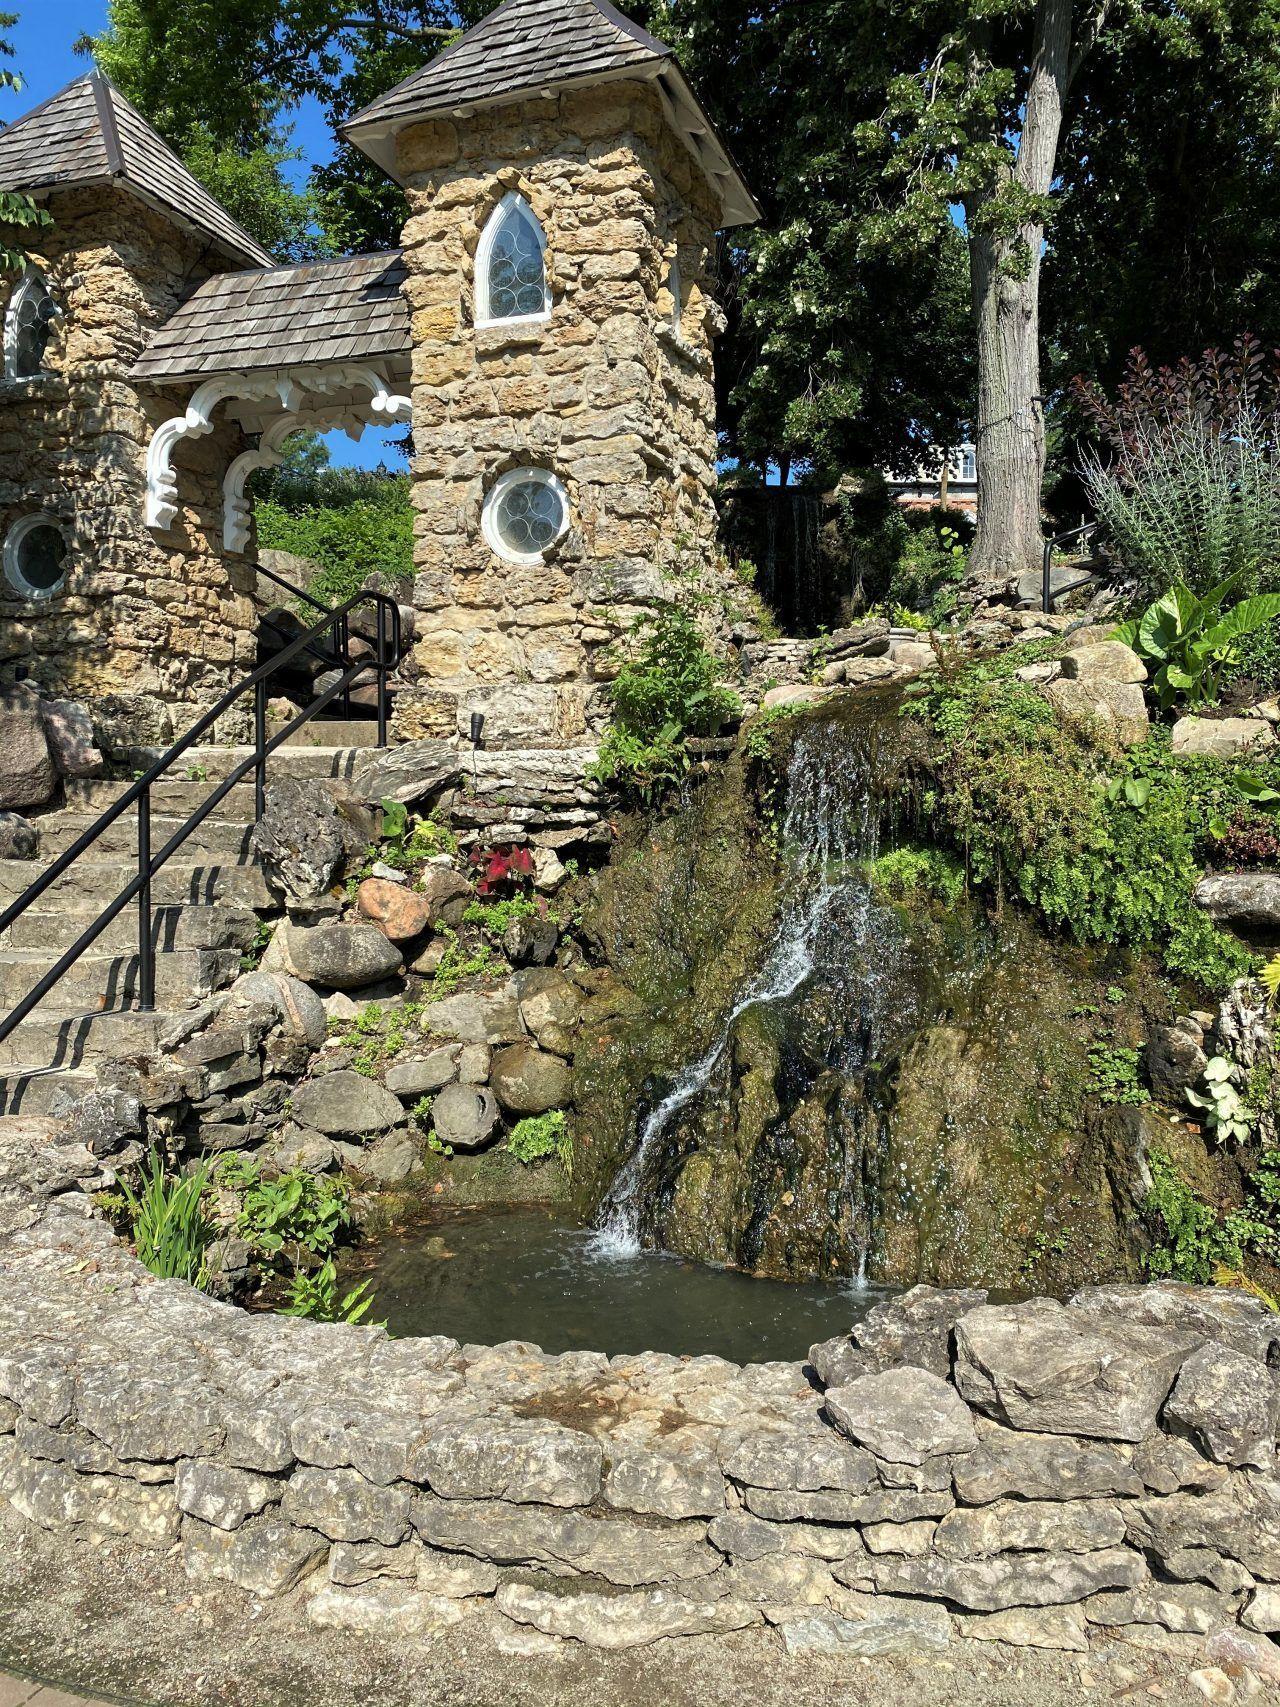 15. Col. Edwin F. Brown Memorial Waterfall & Grotto Gardens